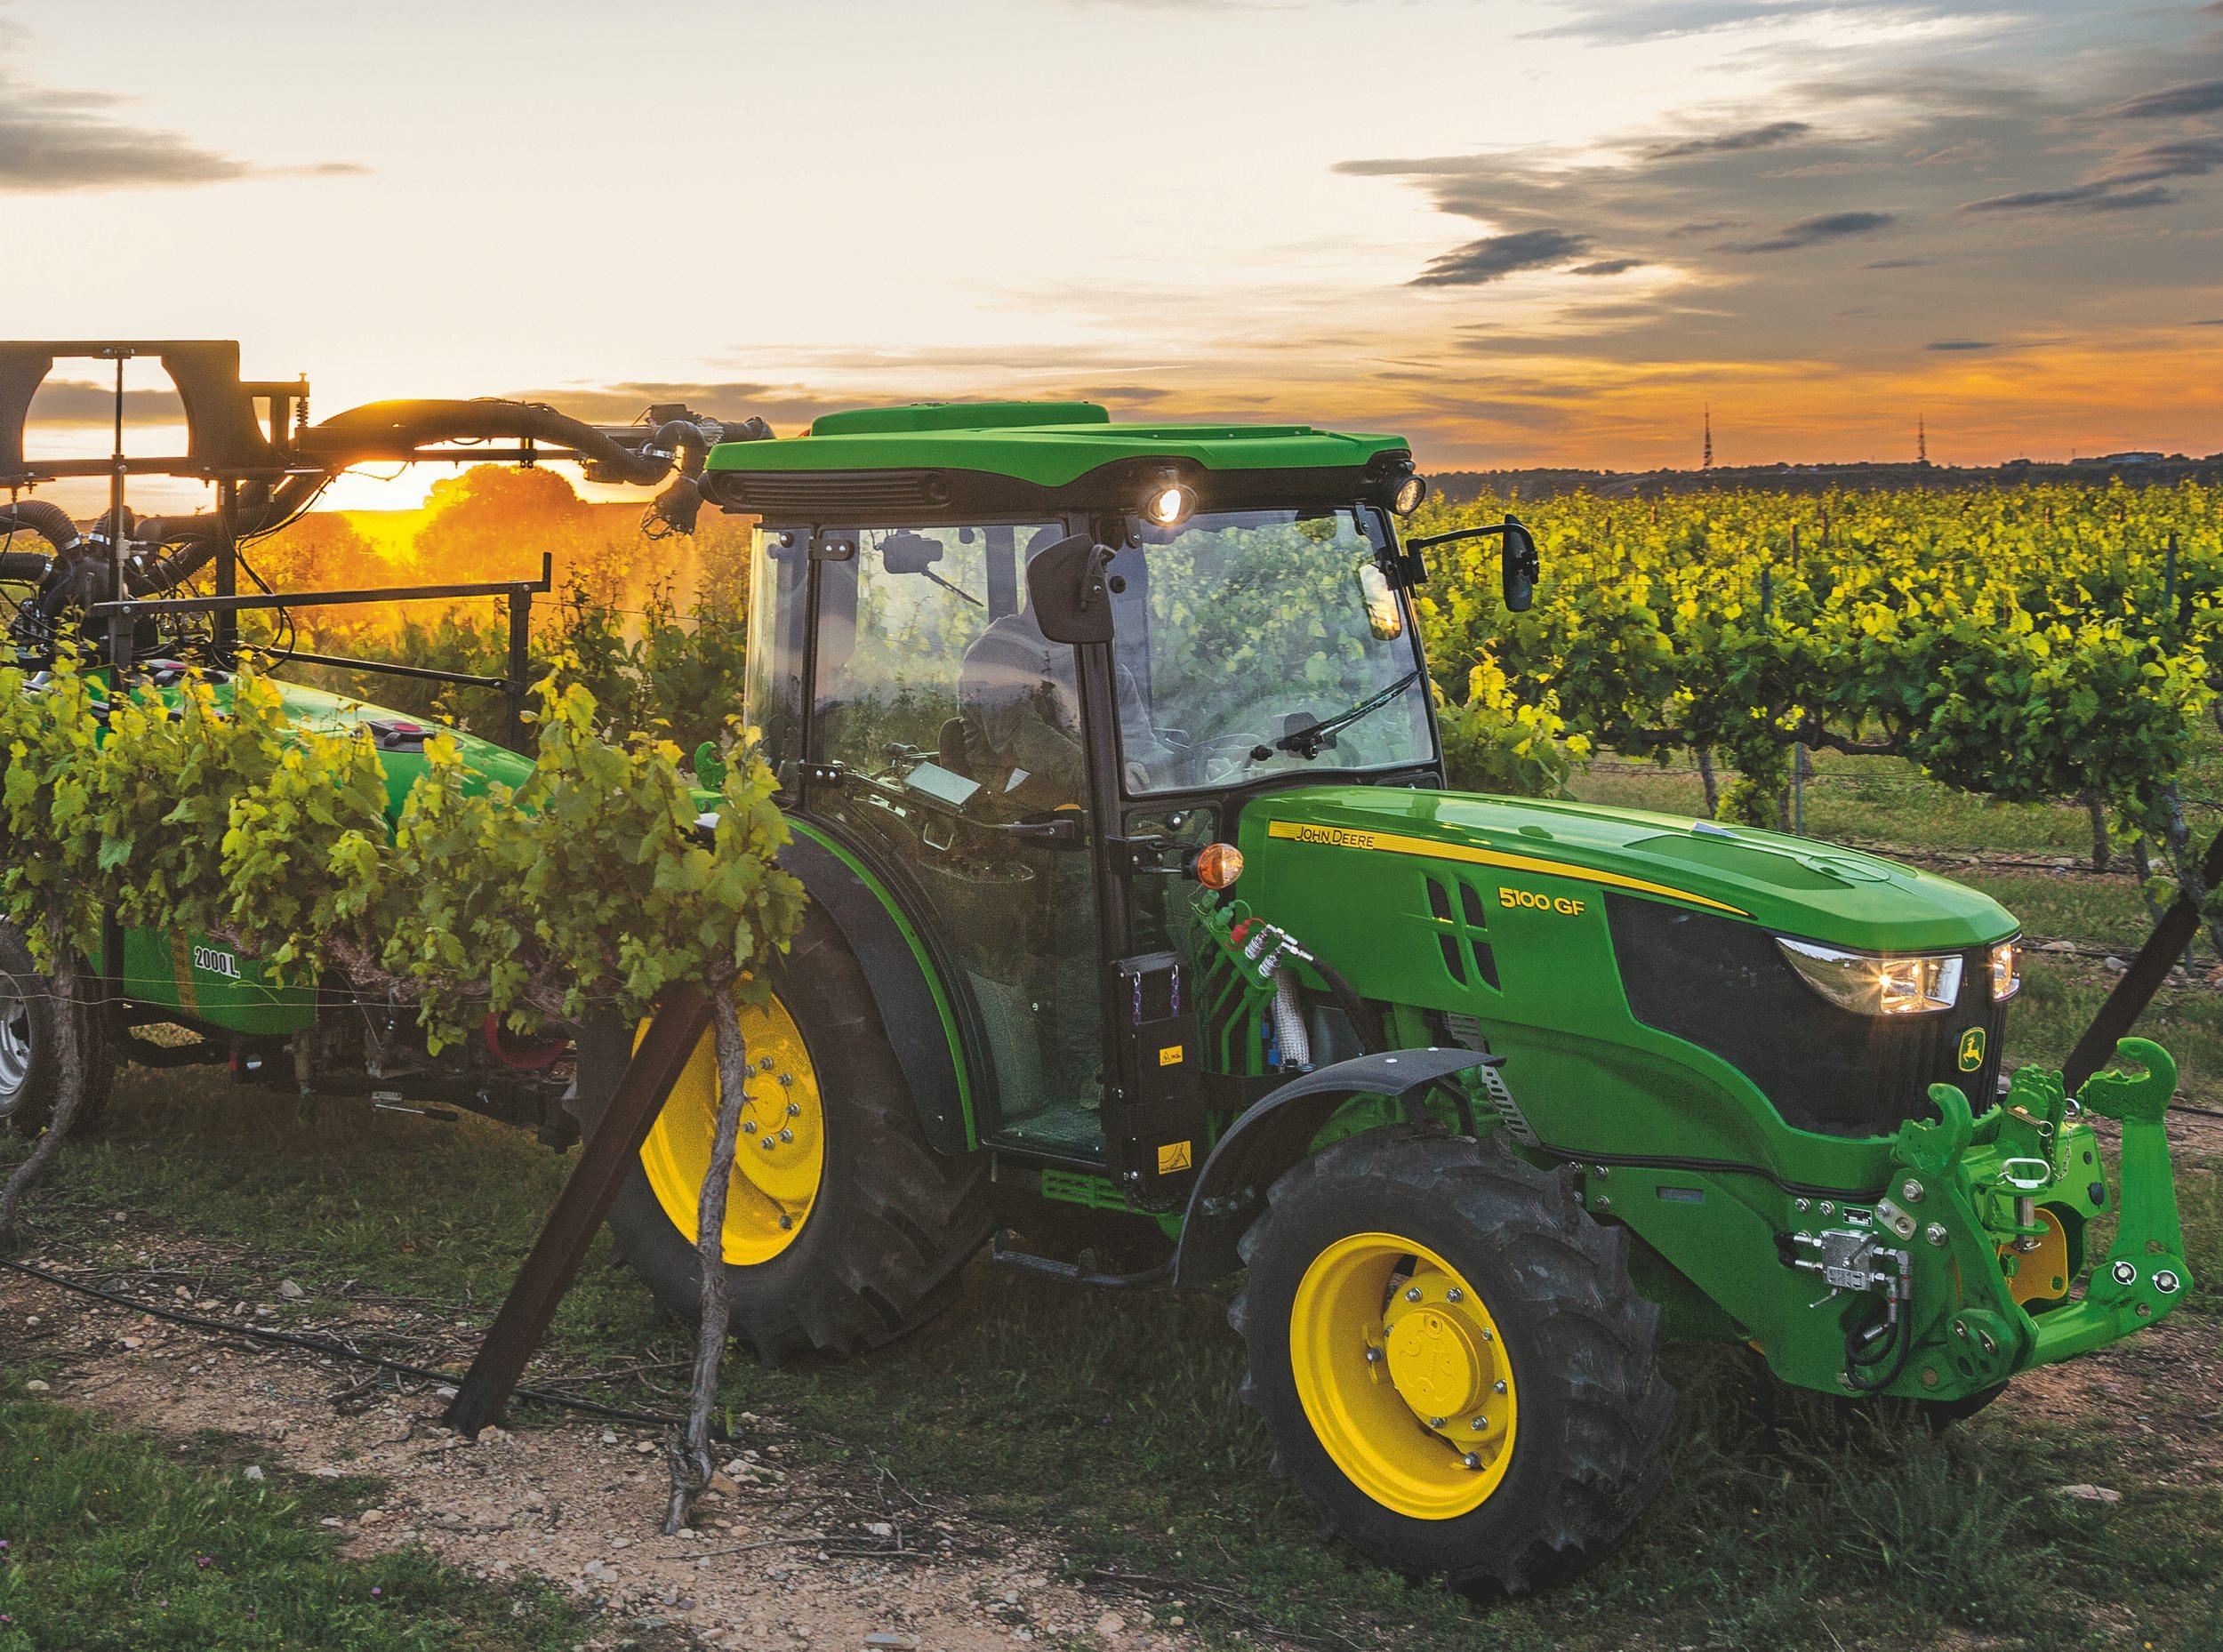 Ventre location reparation tracteurs agricoles